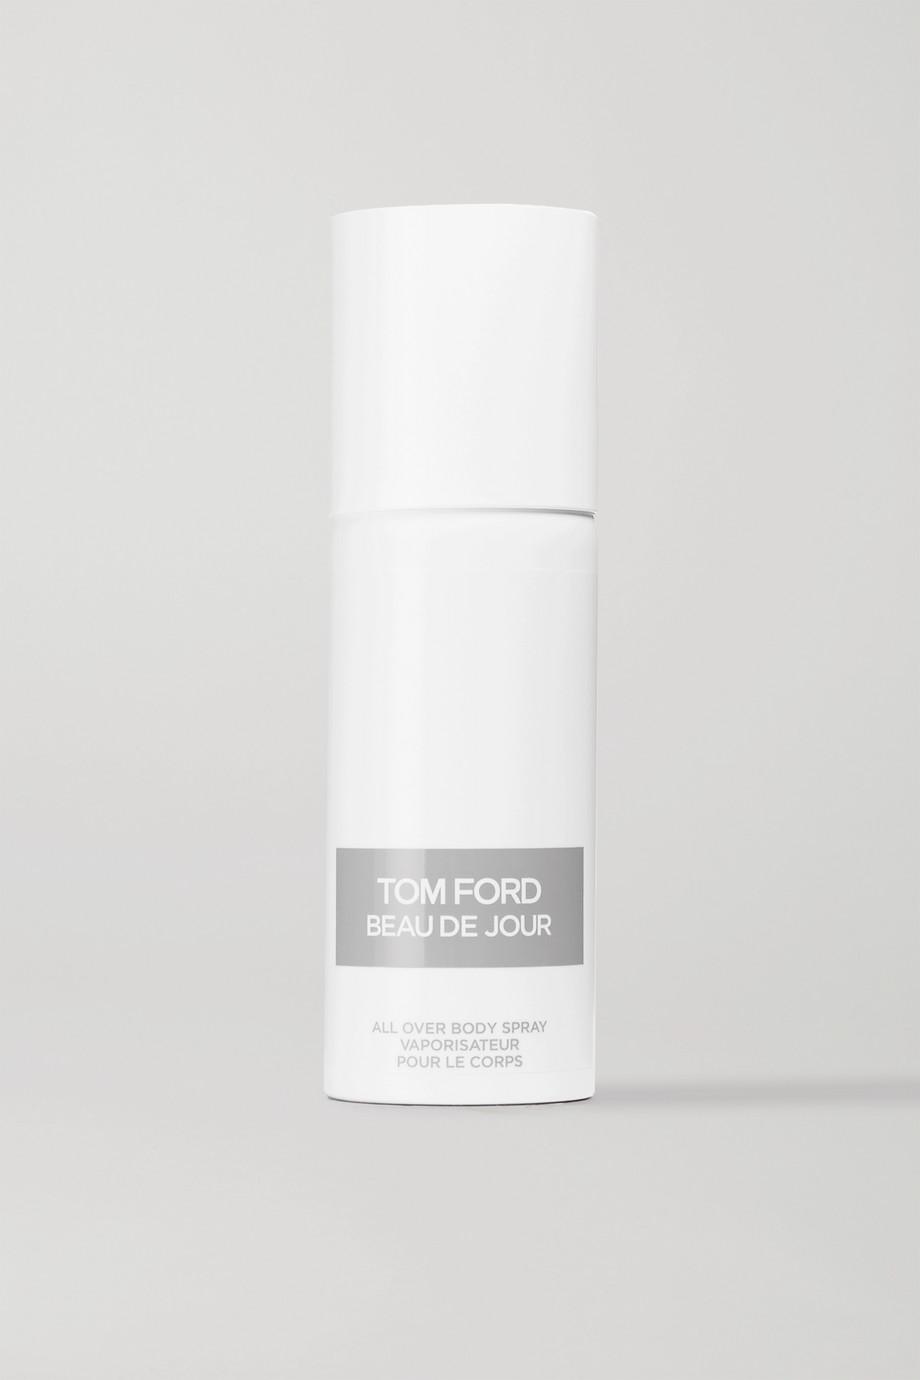 TOM FORD BEAUTY All Over Body Spray - Beau De Jour, 150ml